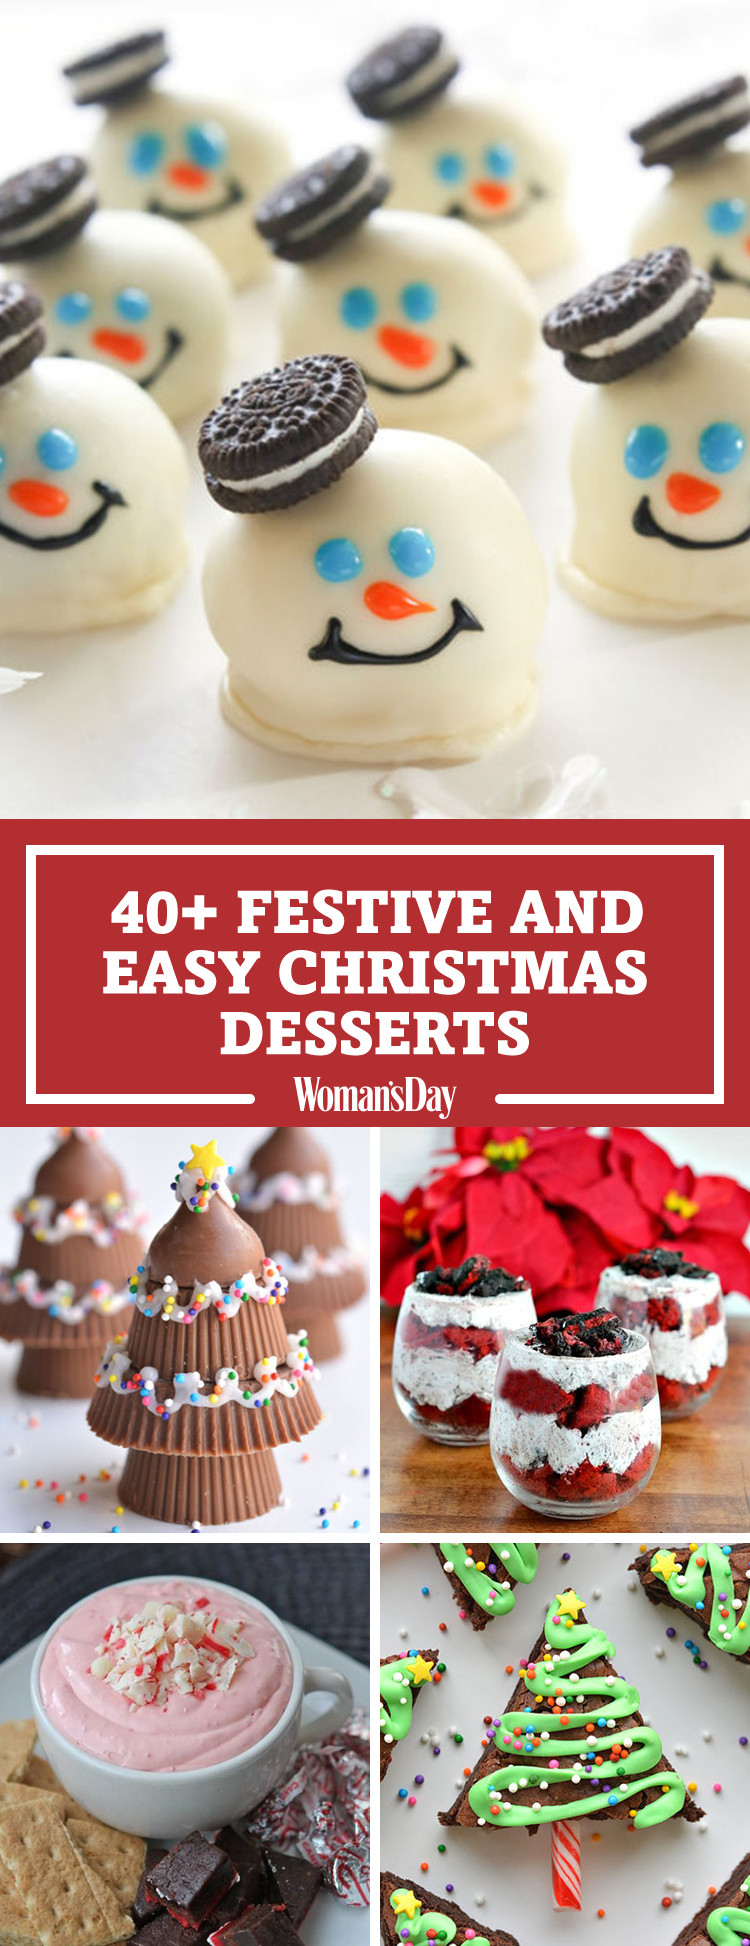 Easy Christmas Desserts Recipes  57 Easy Christmas Dessert Recipes Best Ideas for Fun